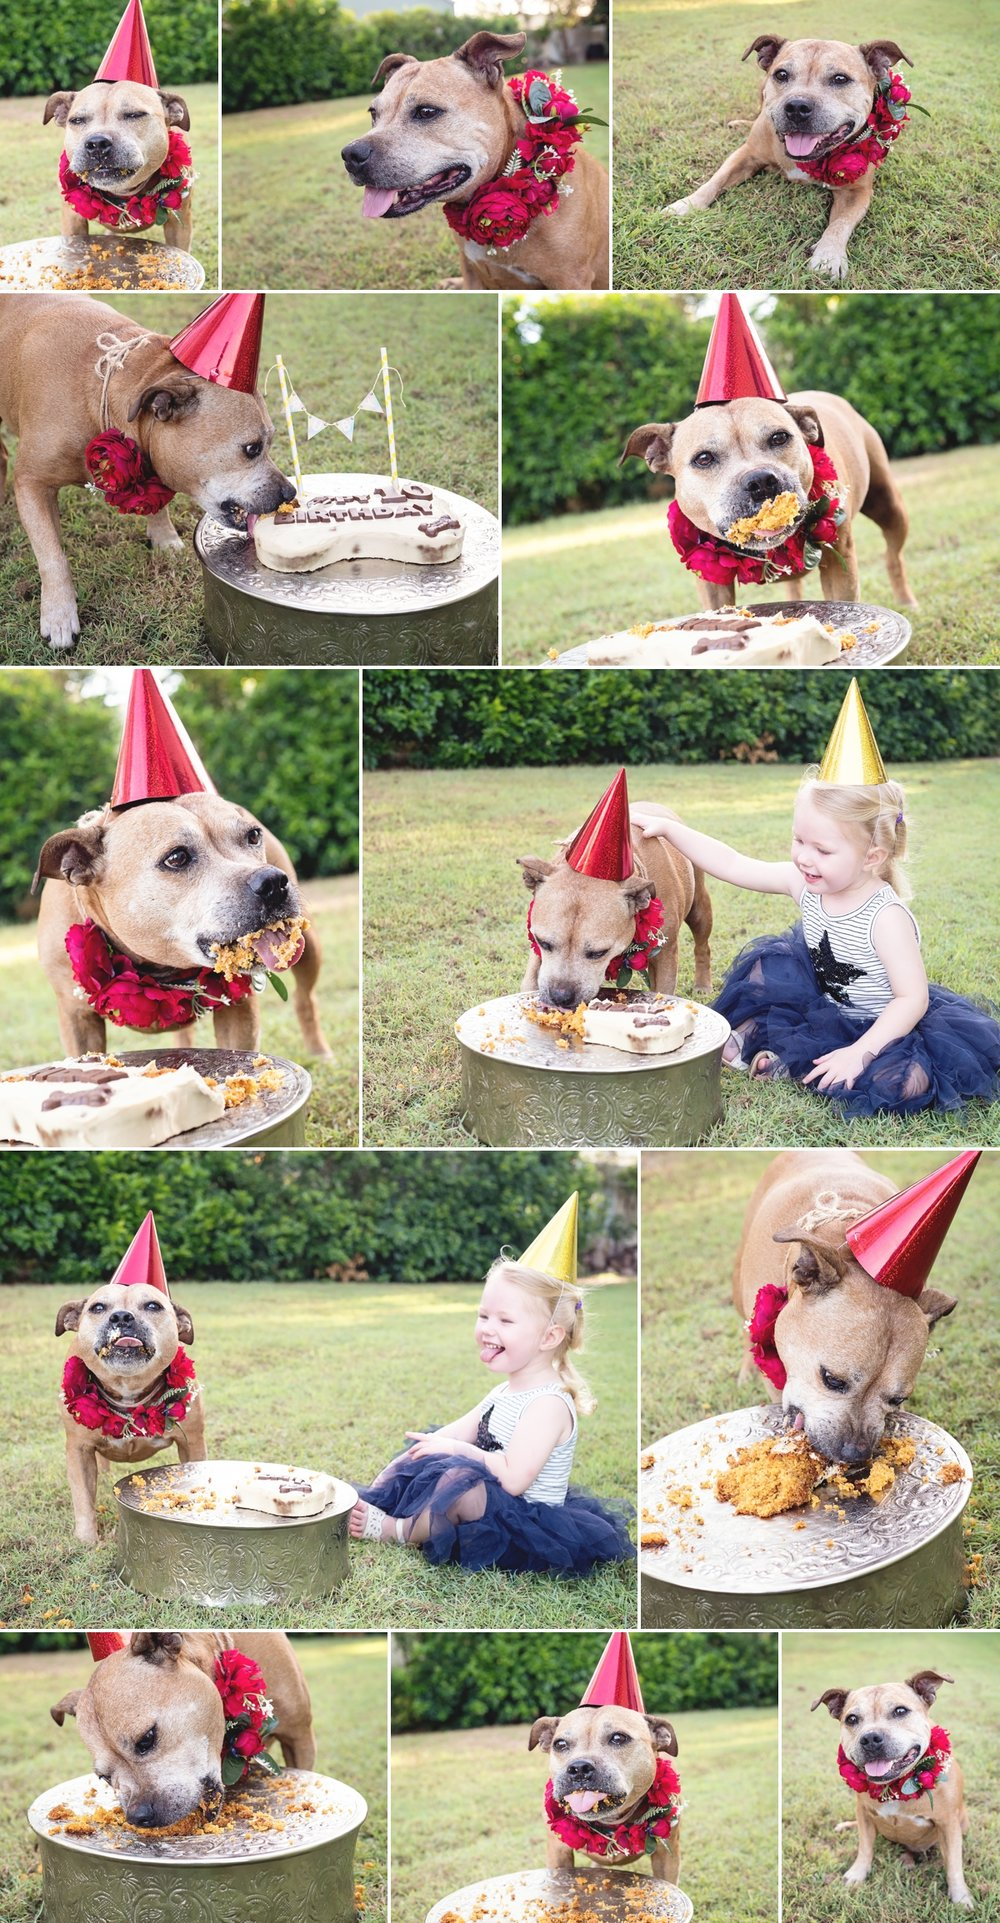 Rubys-10th-Birthday-Cake-Smash-Gallery.jpg